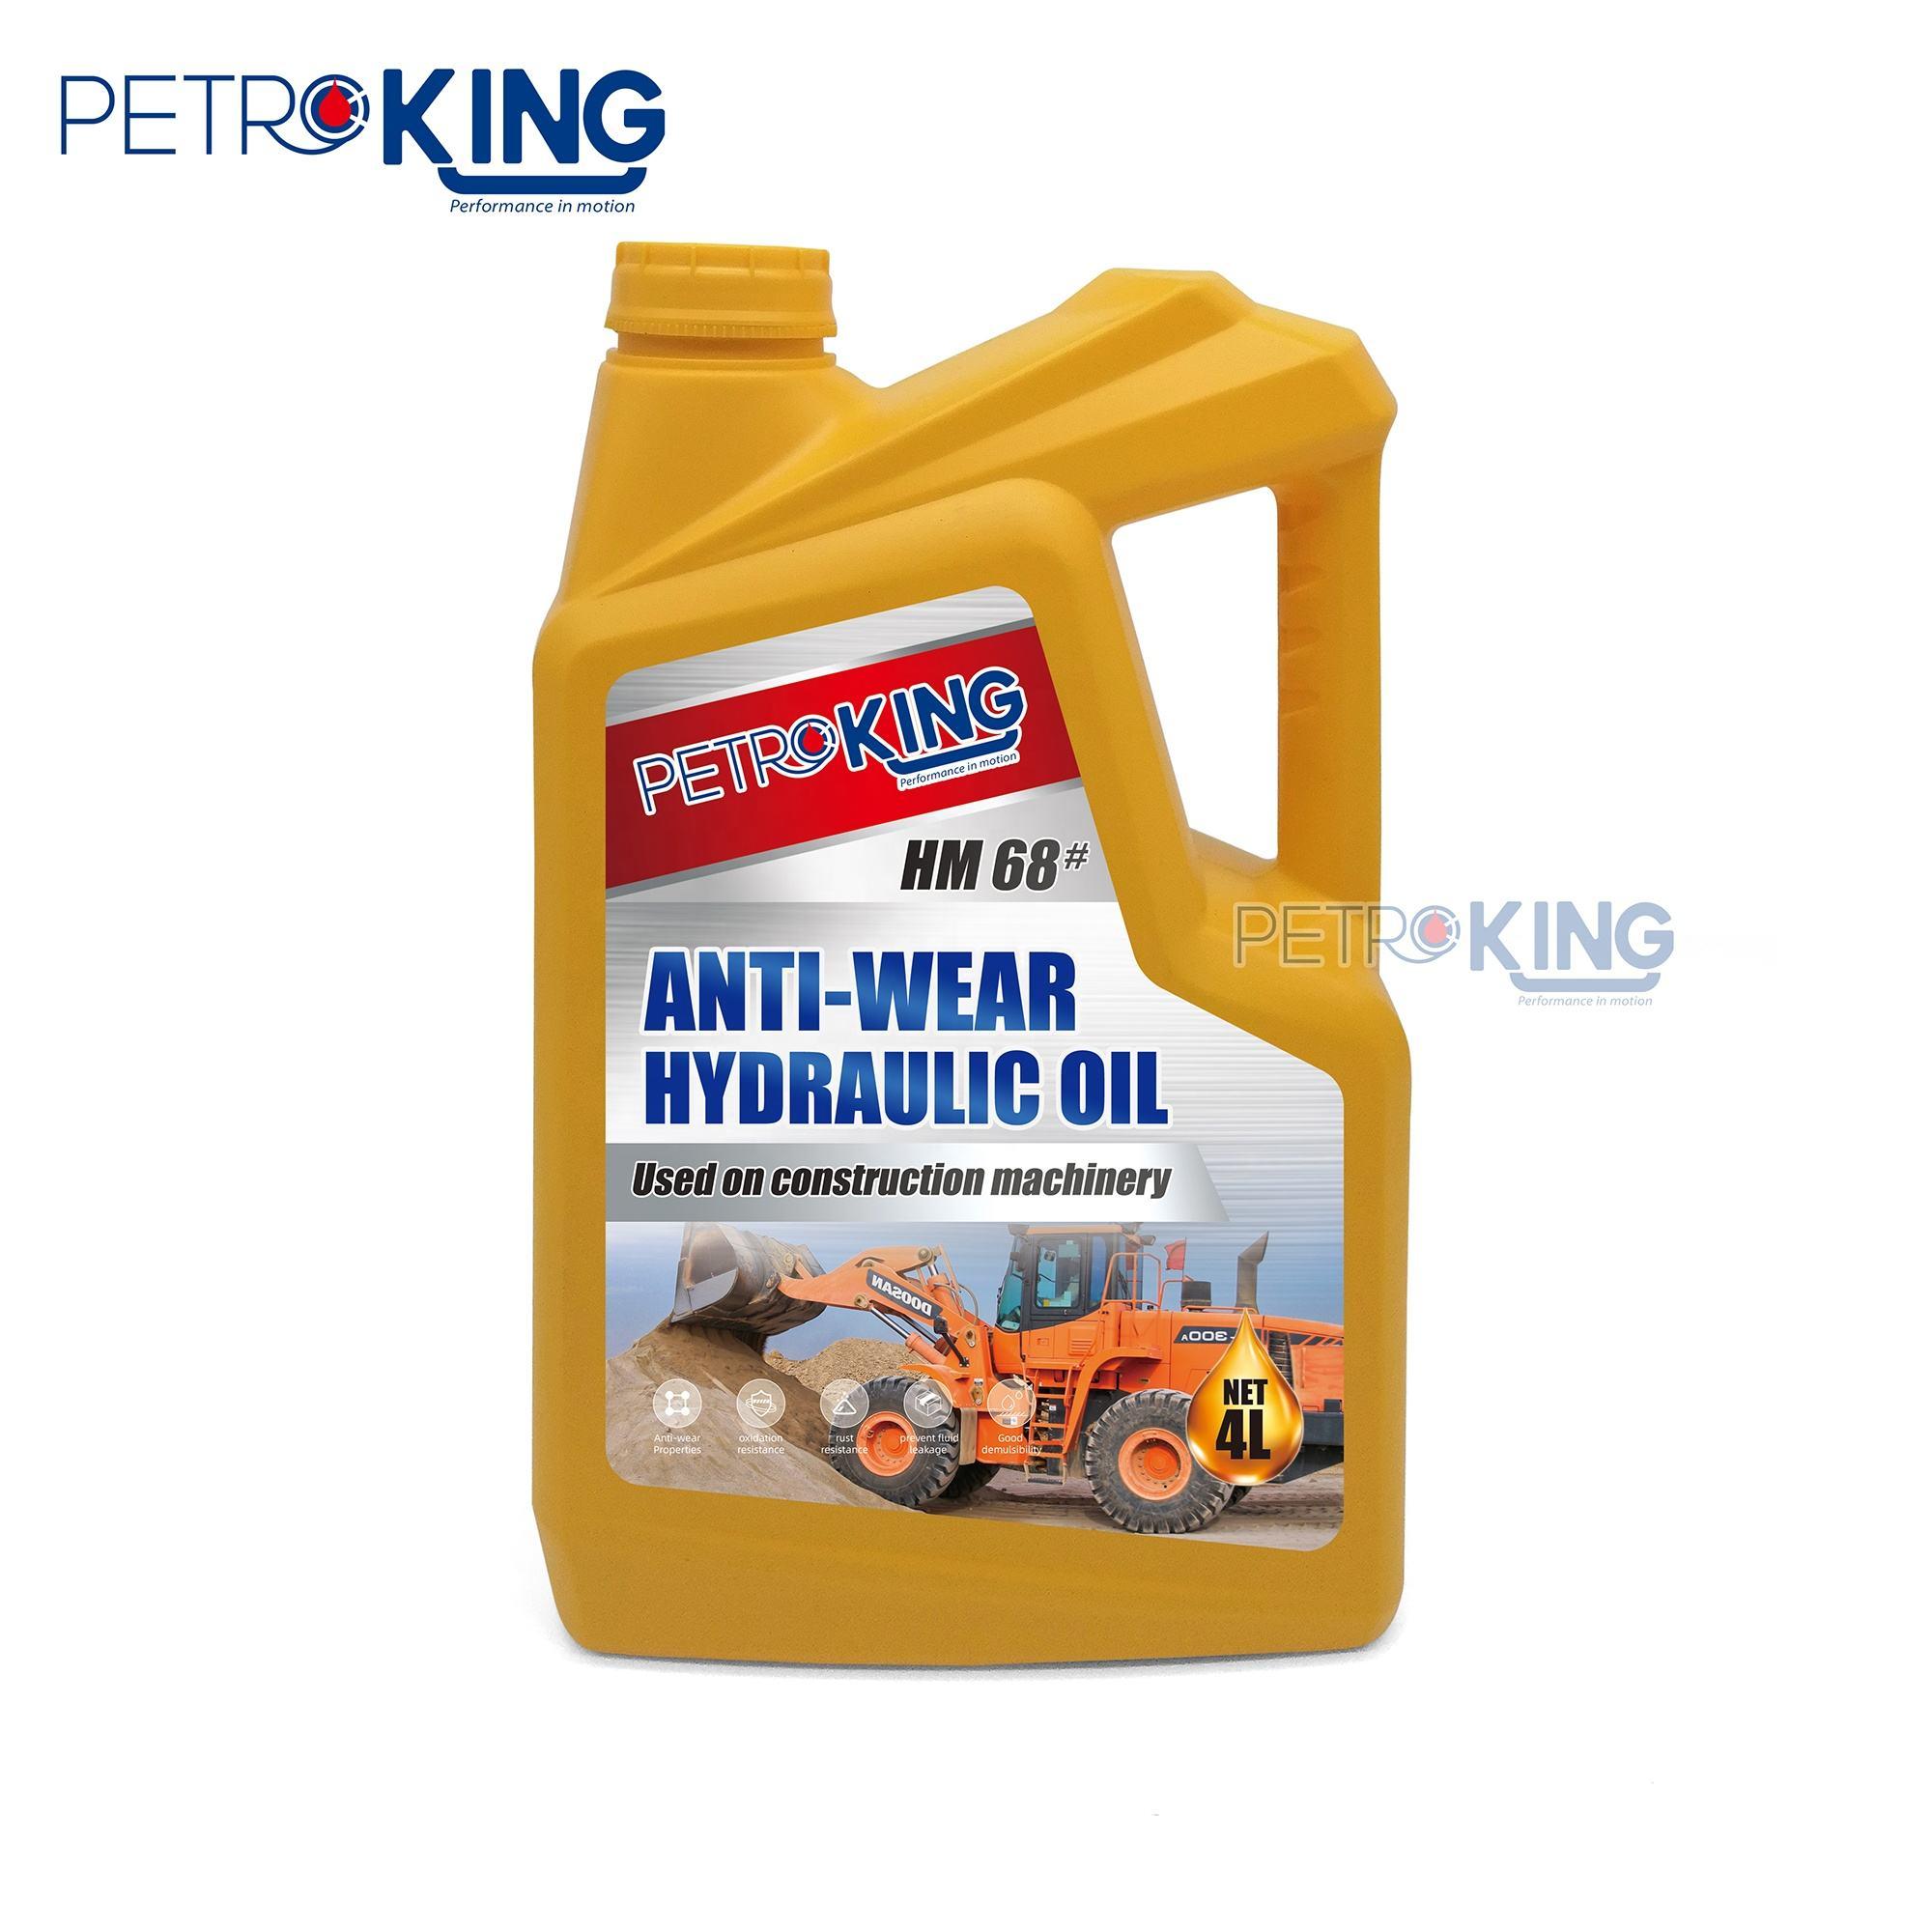 PETROKING HOT SALE 4L Anti Wear Hydraulic Oil #68 Lubricant Oil Lubricants